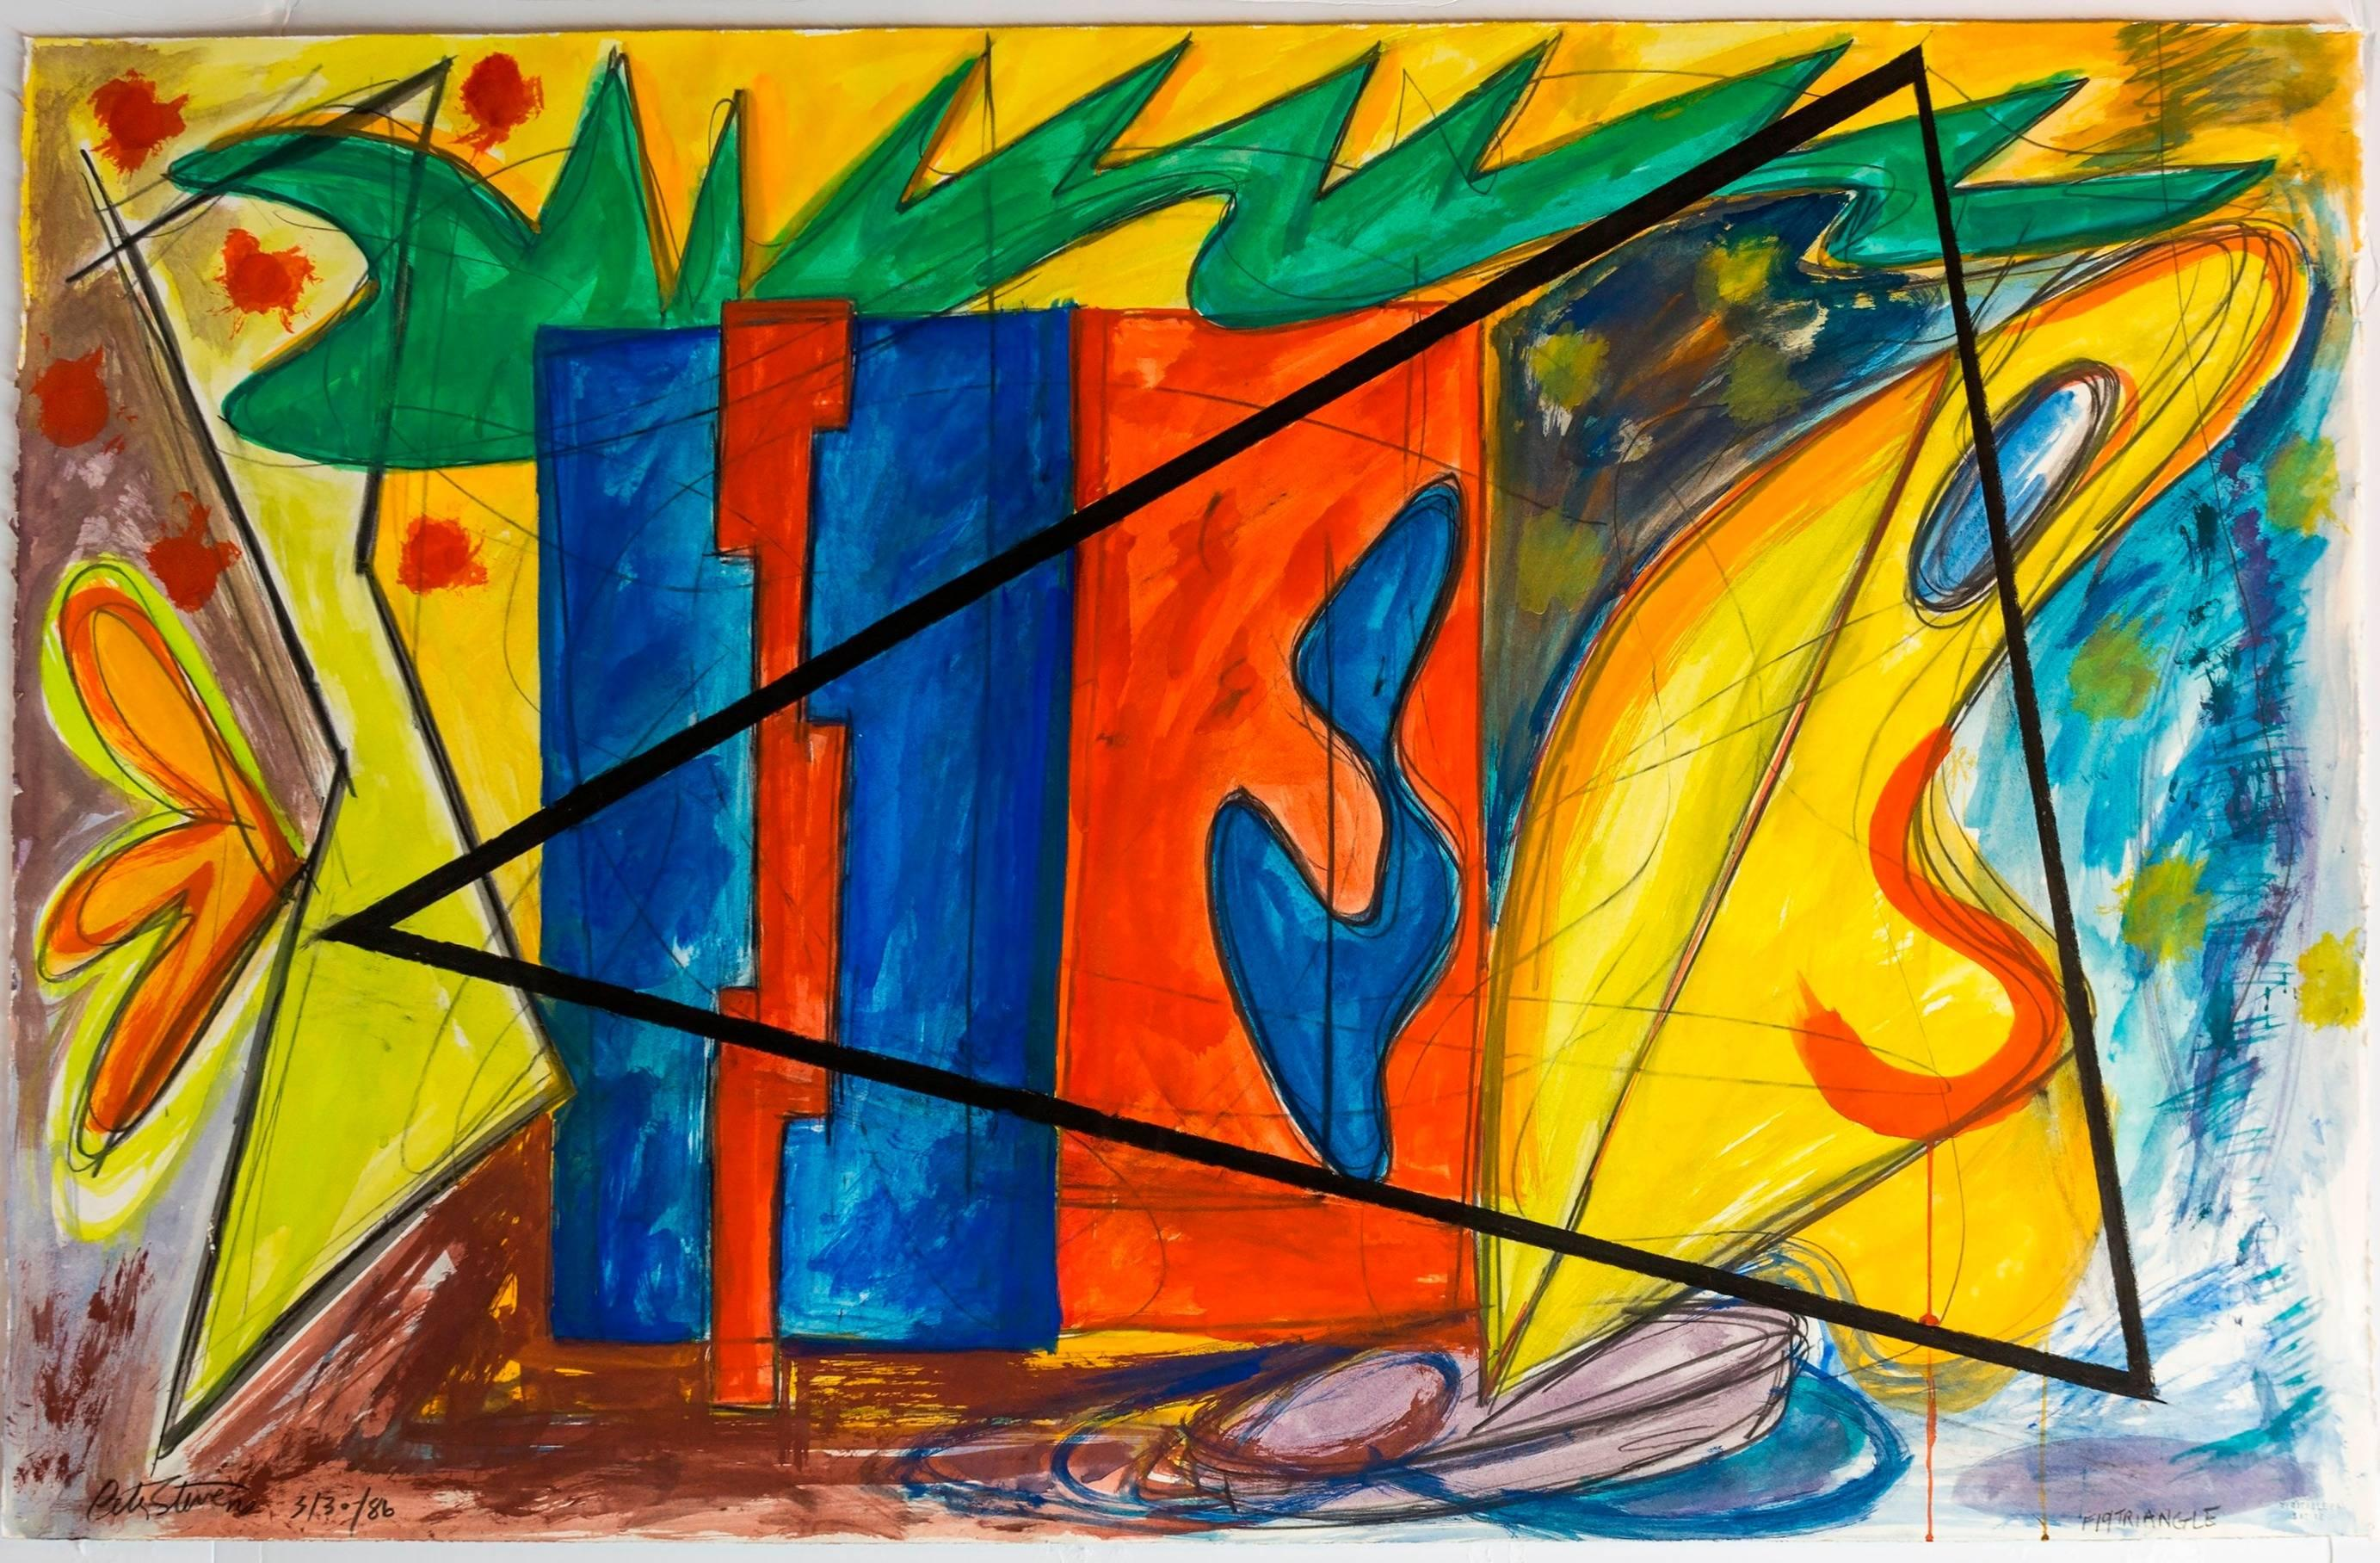 Large 80s Vibrant Dynamic Drawing/Painting Memphis Milano Era